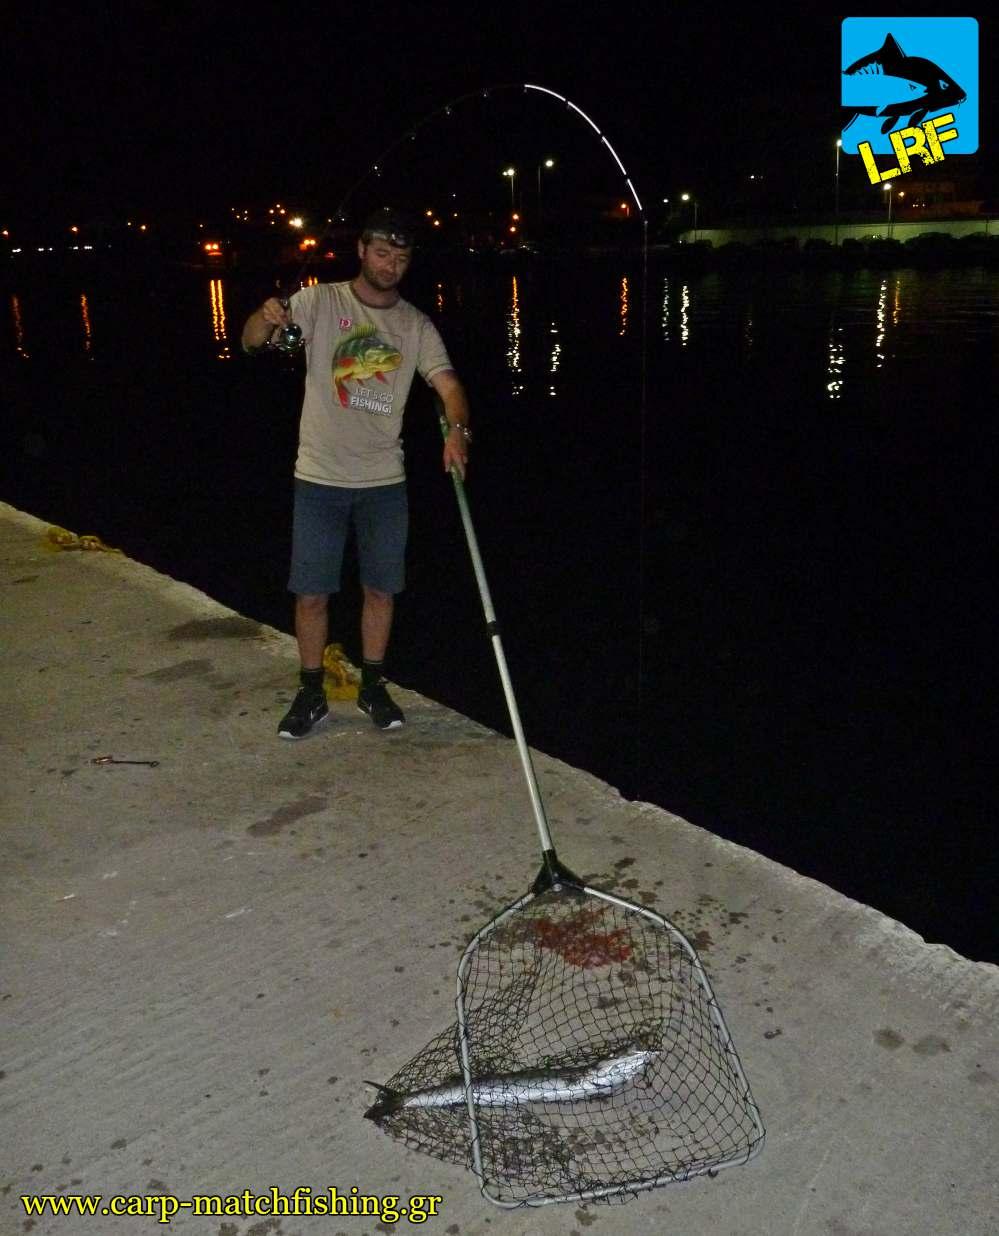 apoxiasma loutsou light rock fishing lrf carpmatchfishing